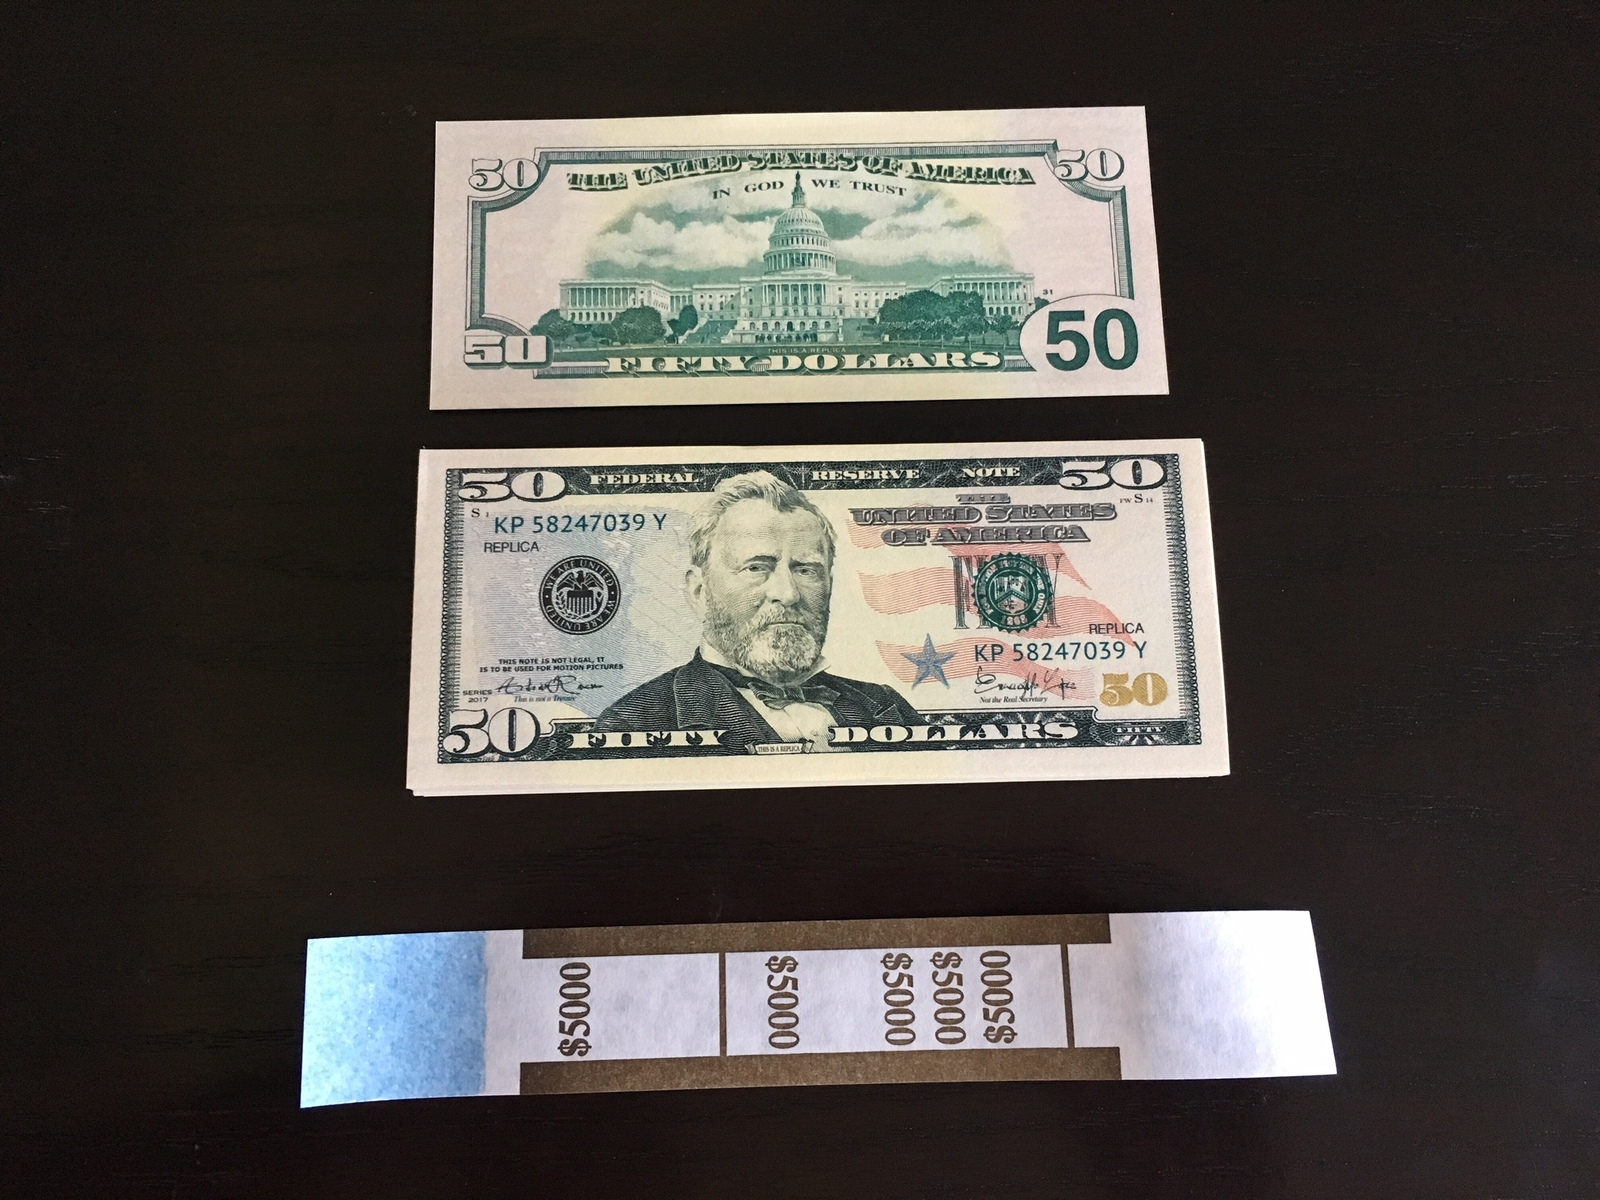 5.000 PROP MONEY REPLICA 50s All Full Print For Movie Video Films etc.